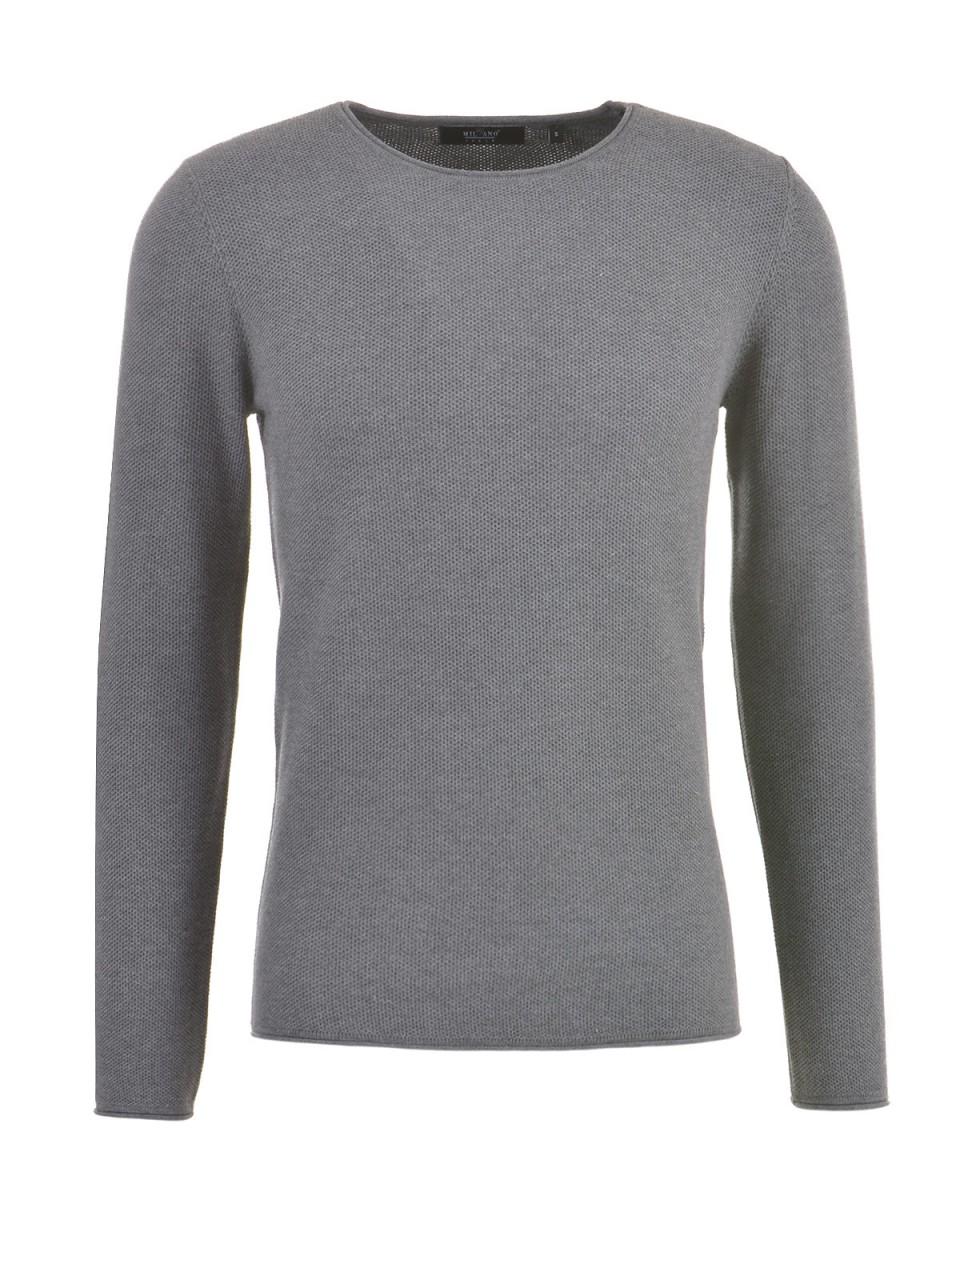 milano-italy-herren-pullover-grau-meliert